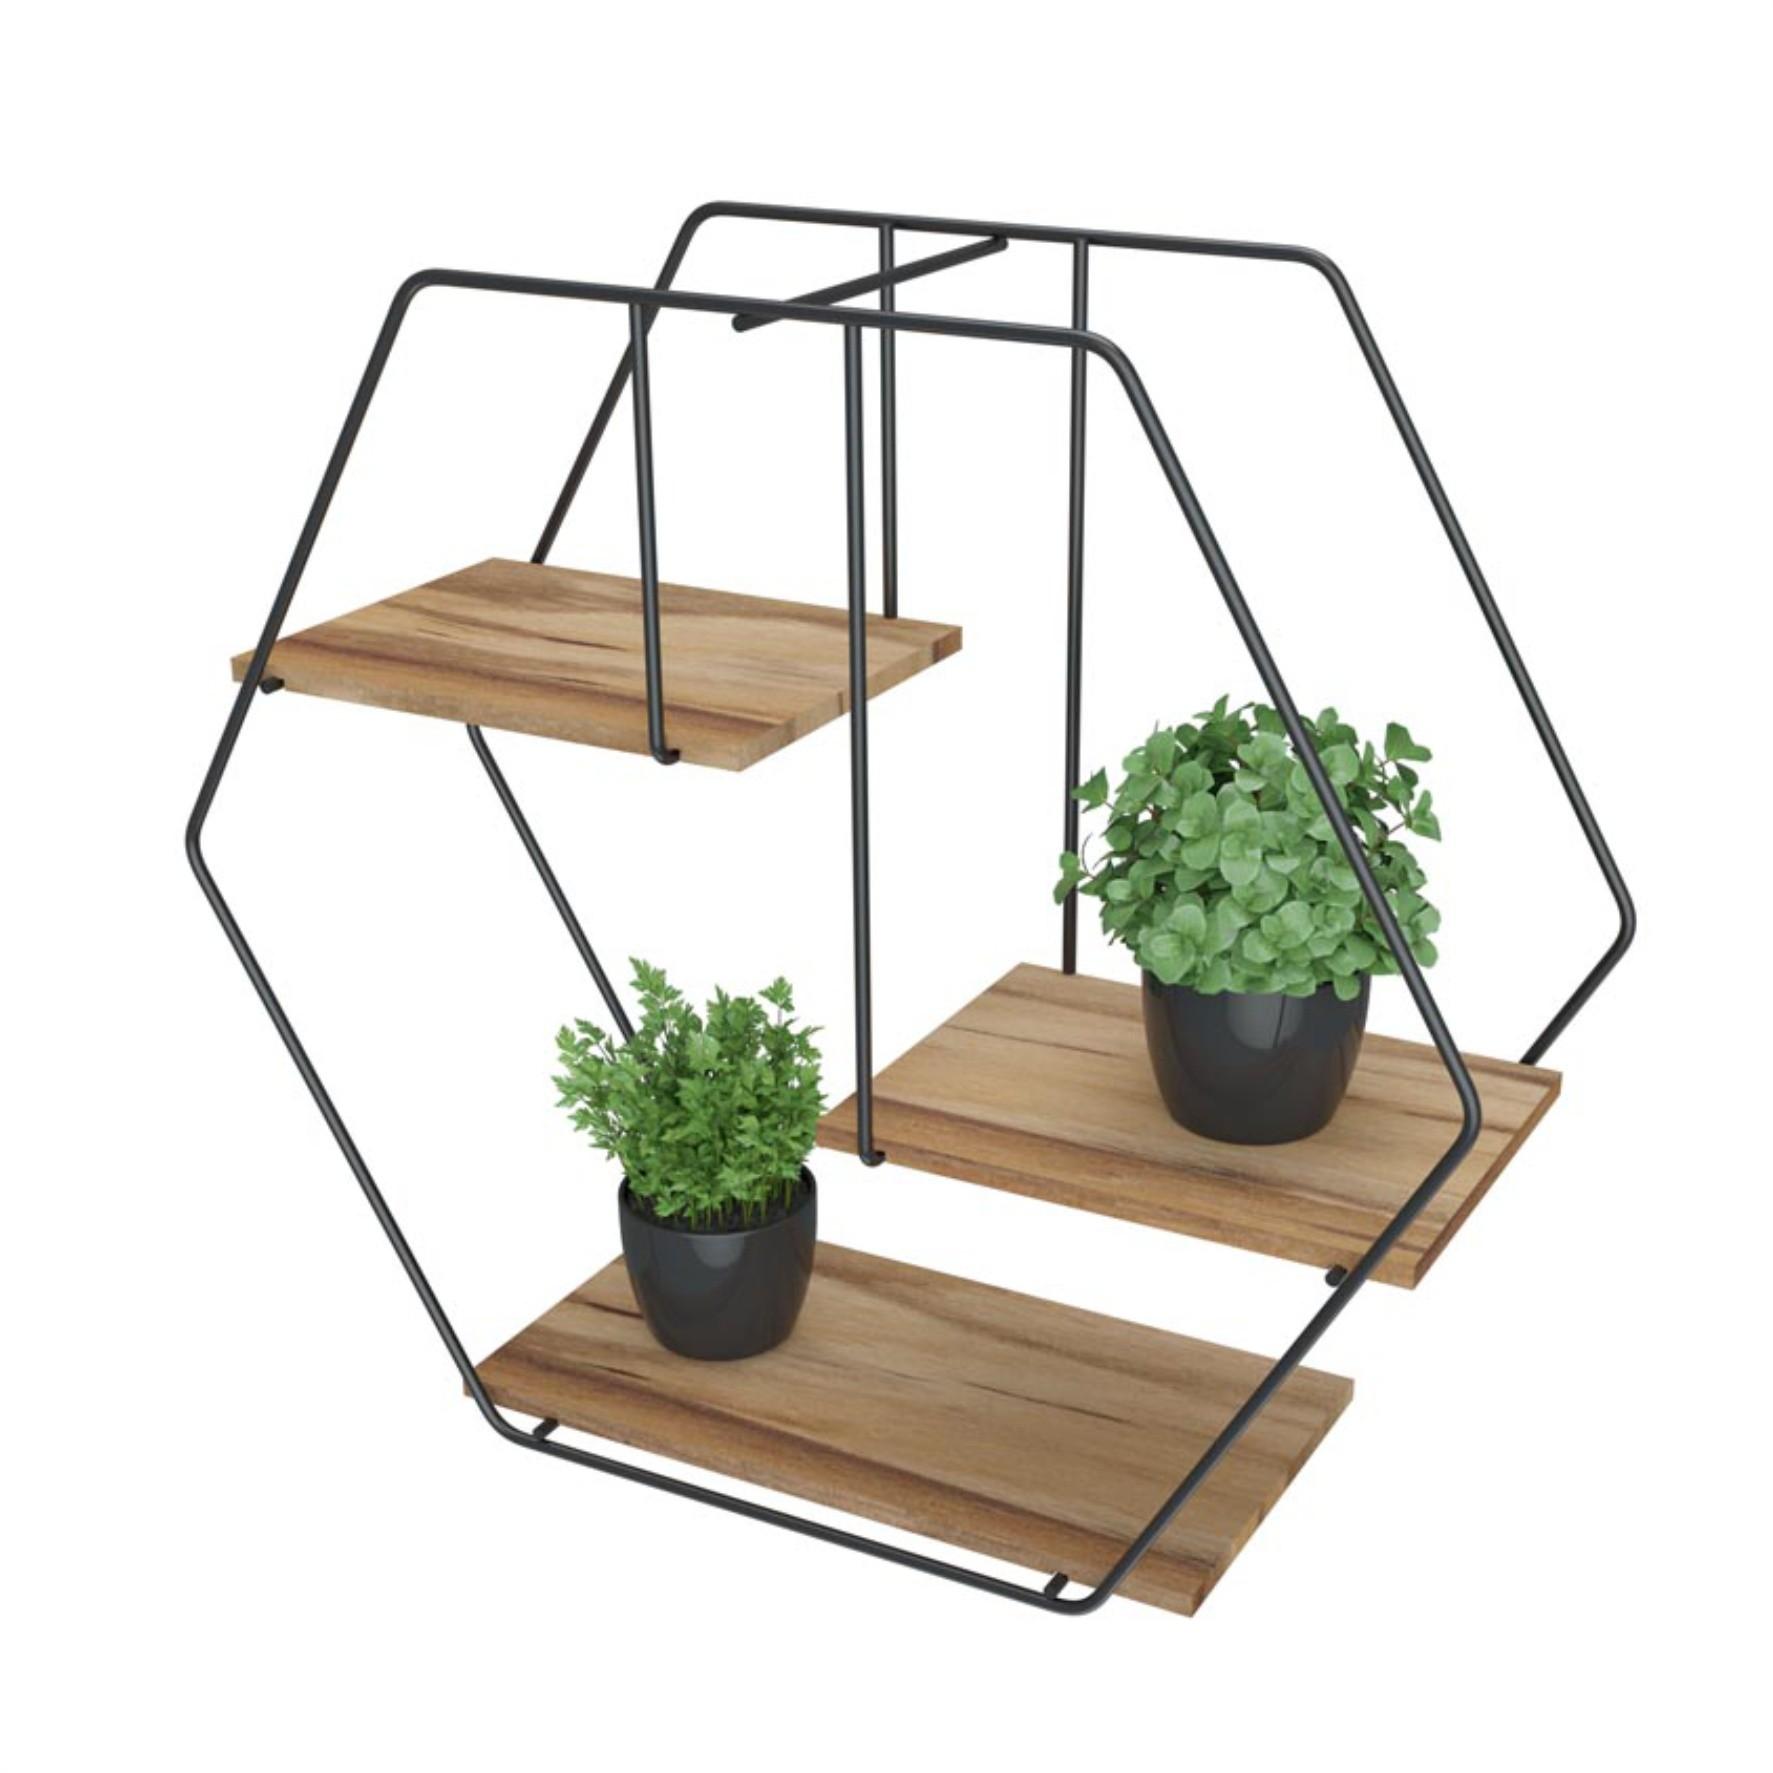 Prateleira Decorativa Hexagonal Firmato - Stolf